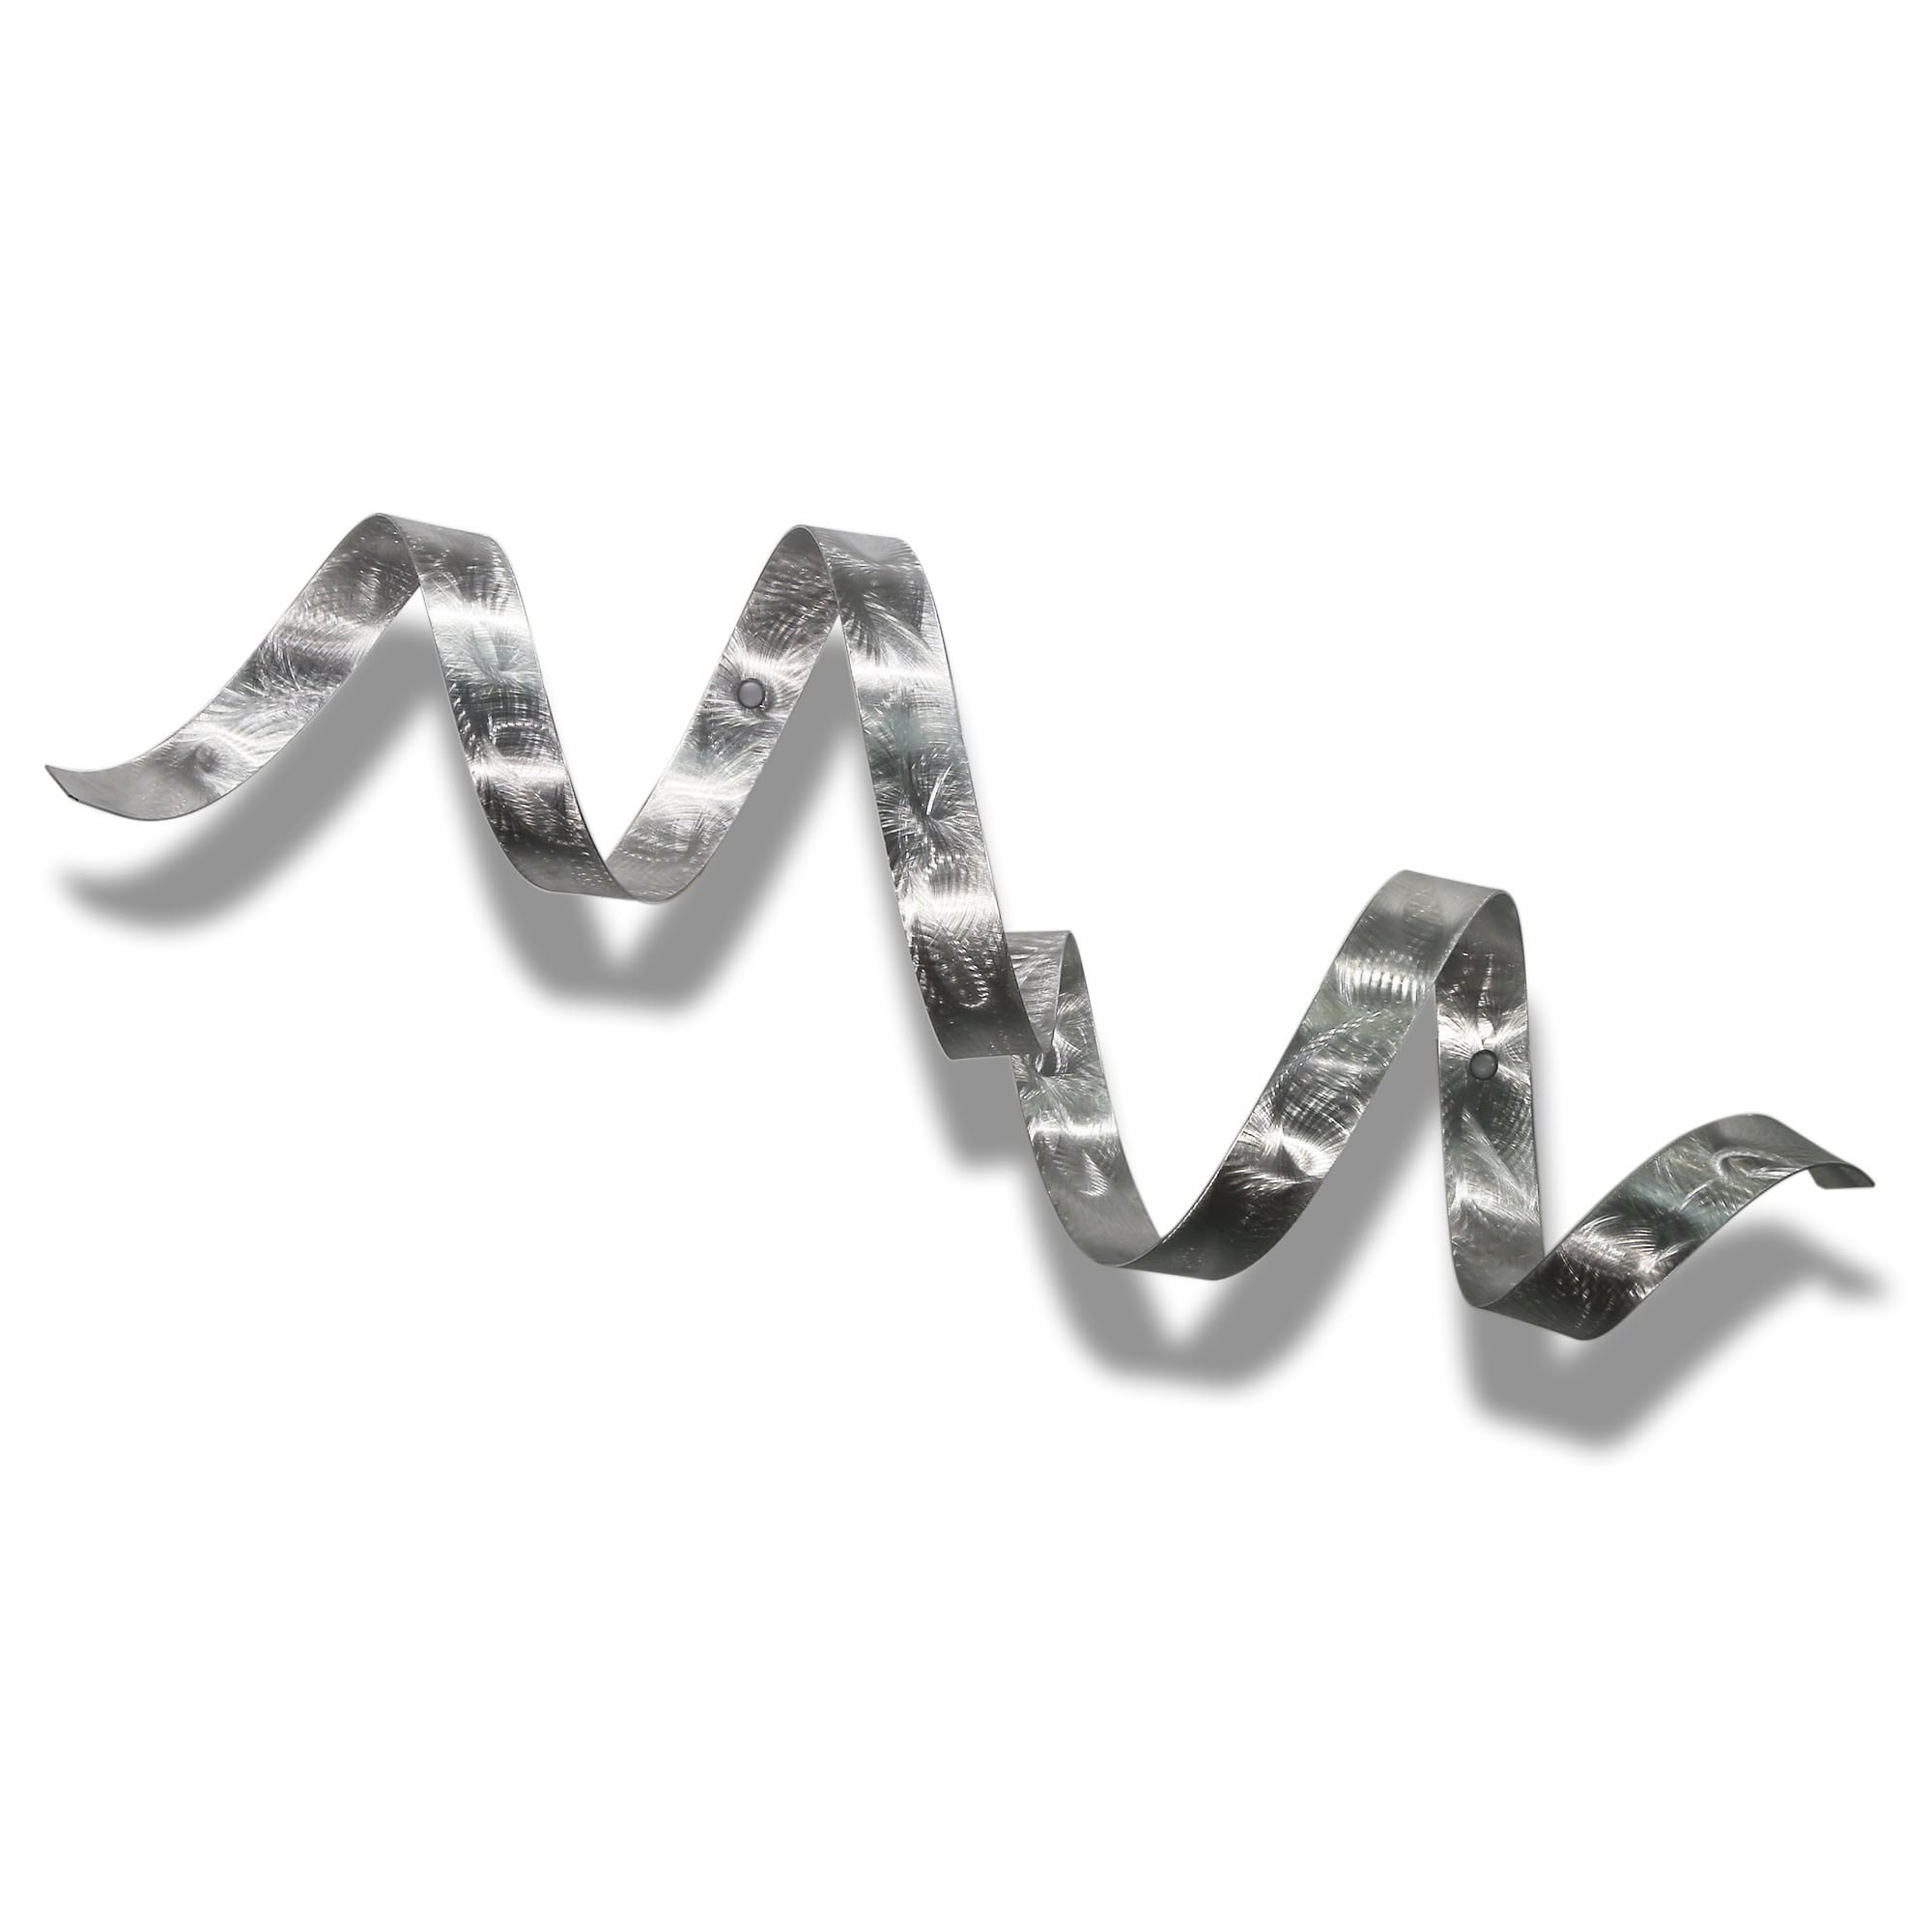 Statements2000 Silver Modern Metal Wall Art Sculpture Accent Decor By Jon Allen Twist